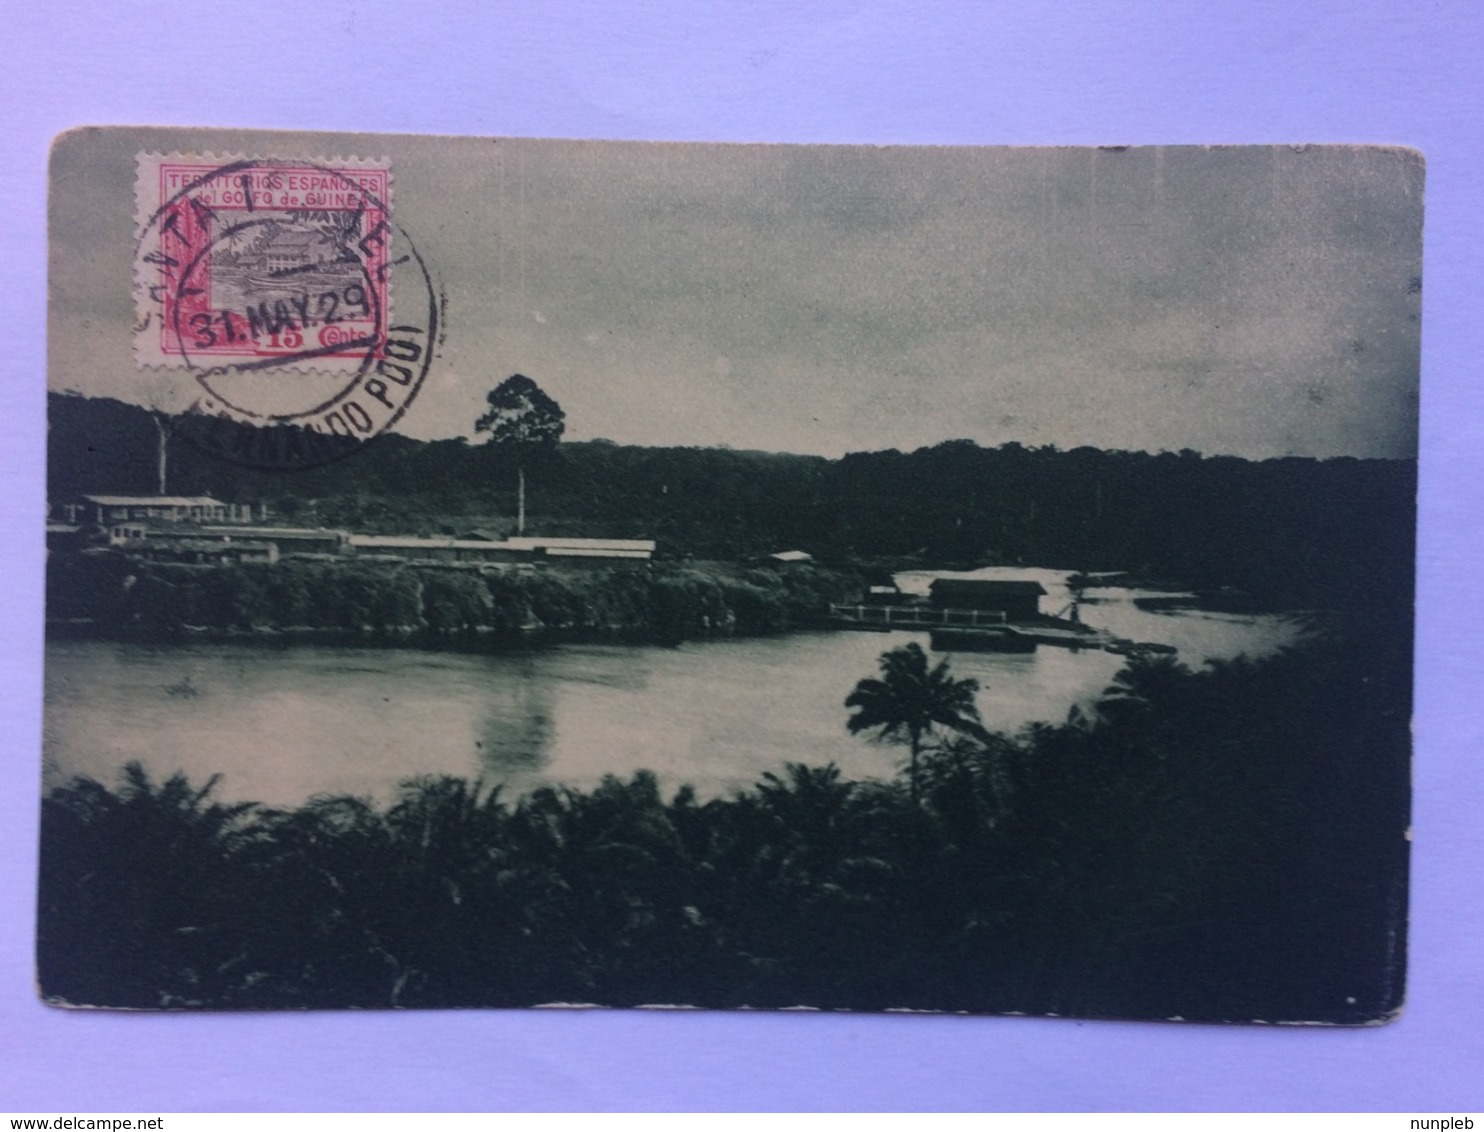 EQUATORIAL GUINEA - Vista General De Cabo San Juan - Pabellon Colonial En La Exposicion Ibero-Americana Sevilla 1929 - Equatorial Guinea